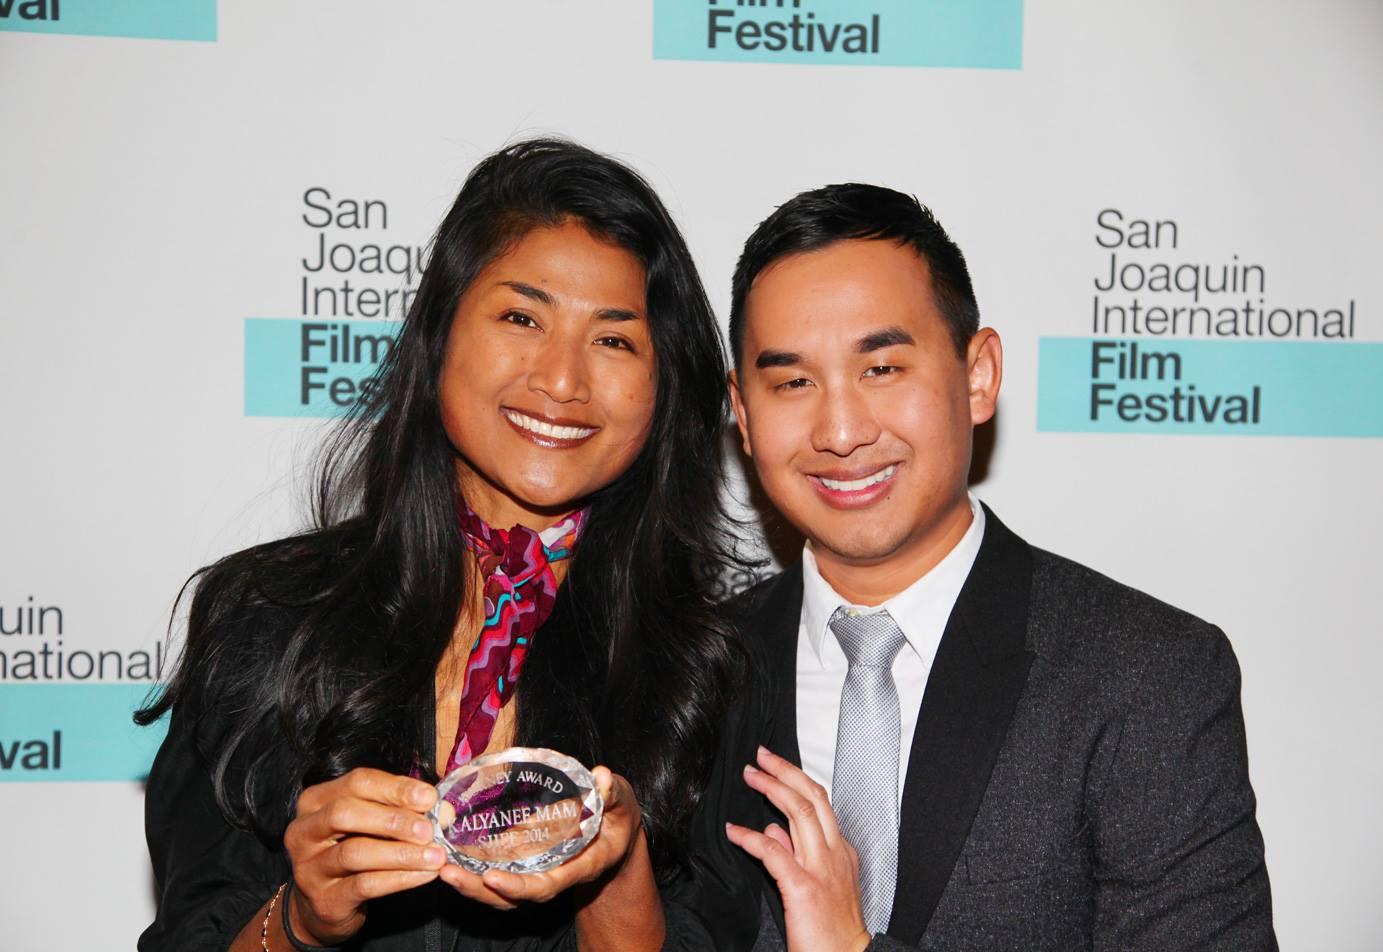 Cambodian-born filmmaker Kalyanee Mam, left, with Cambodian-born film festival programmer Sophoan Sorn, director of the San Joaquin International Film Festival in Stockton, in January 2014. Via SJIFF.